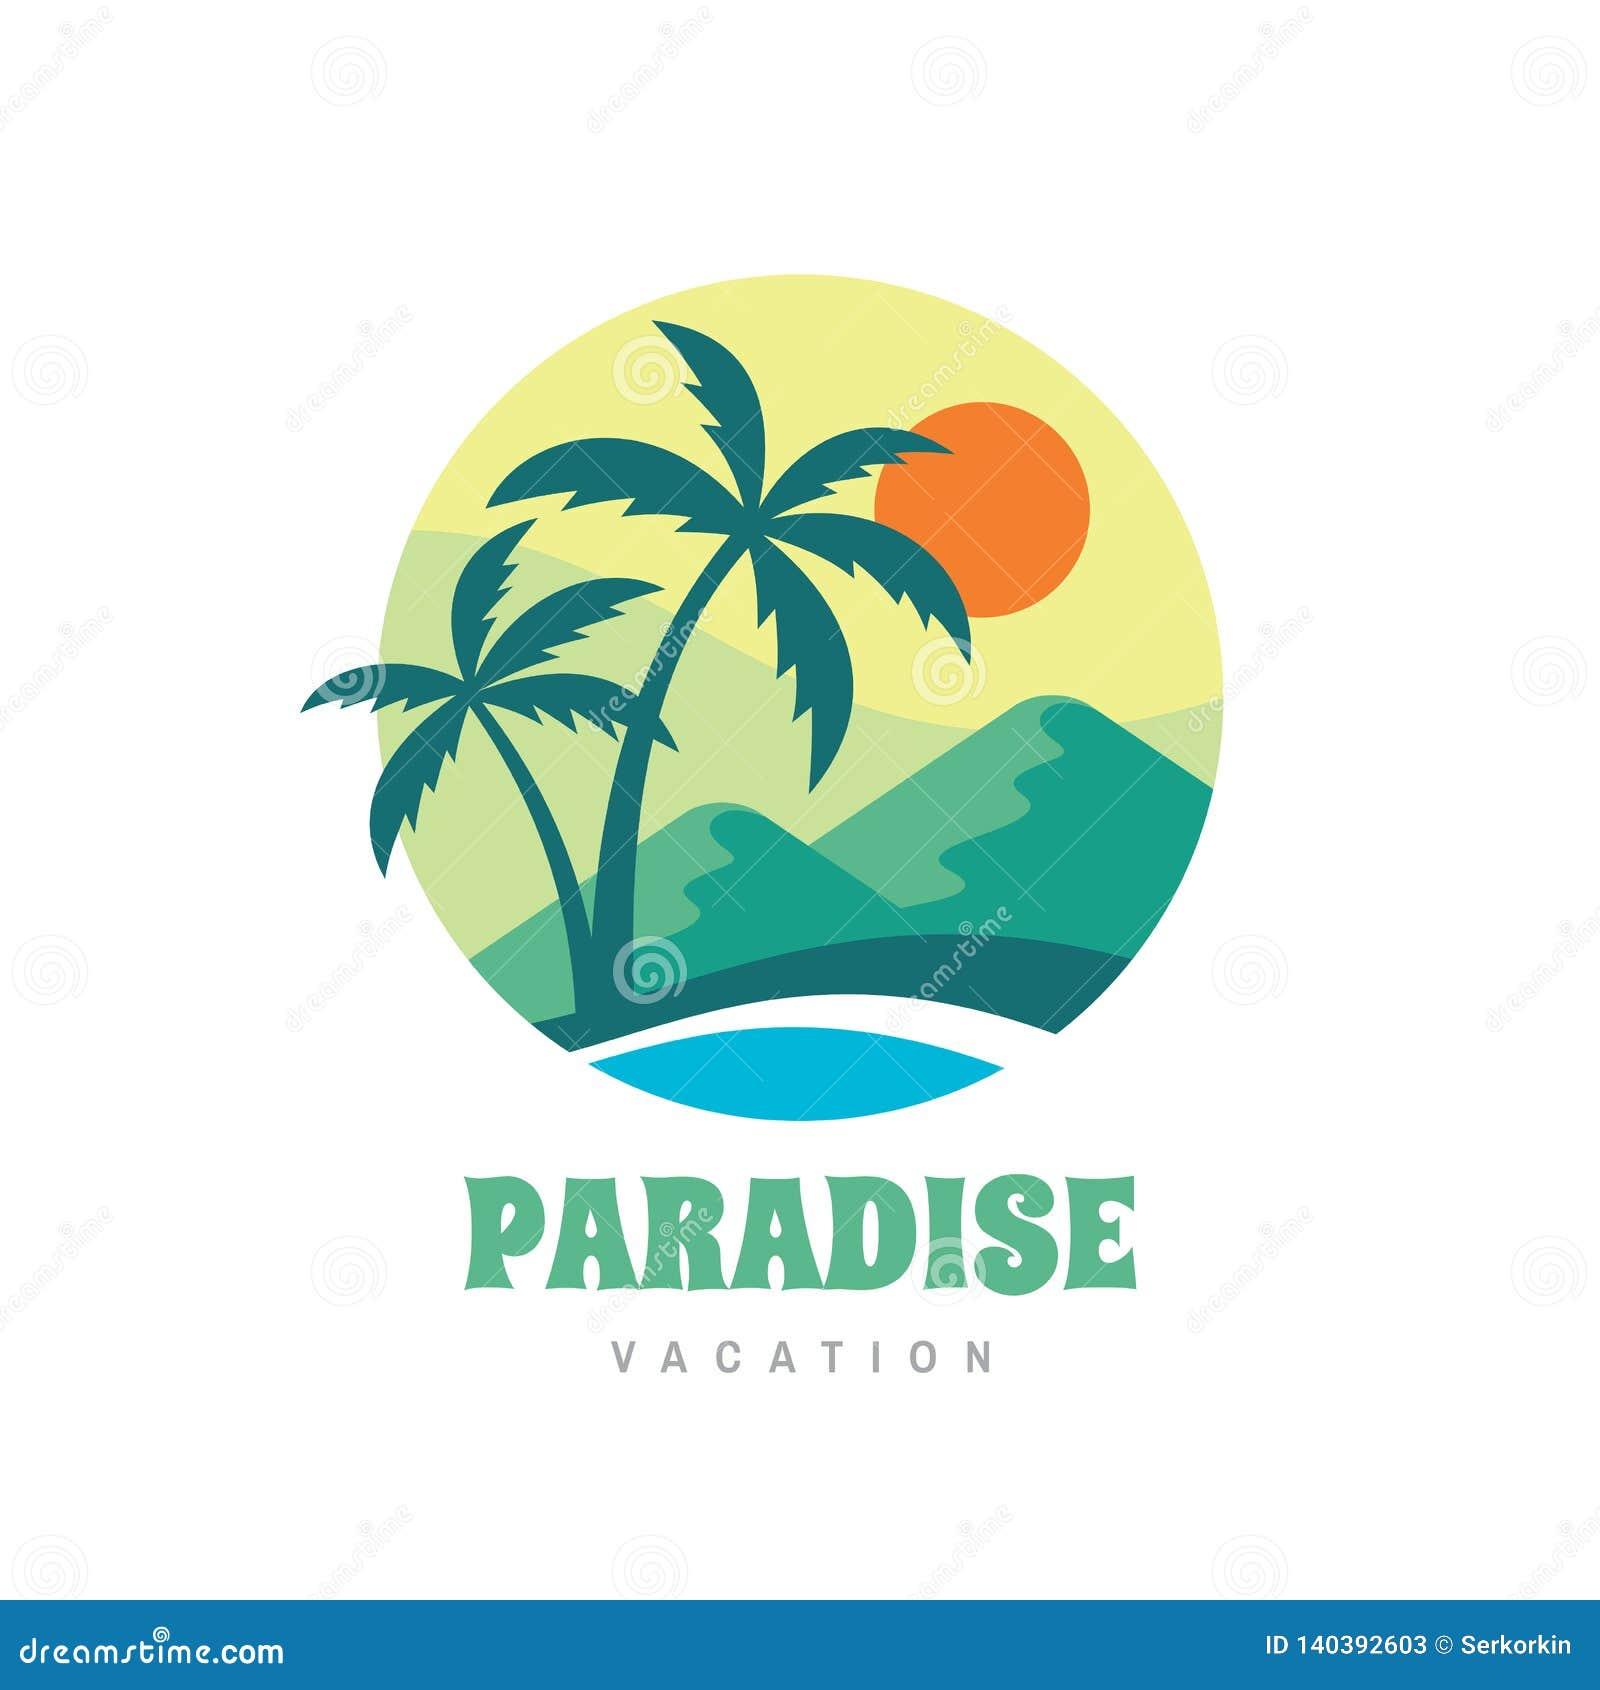 482af9da4 Tropical summer holiday creative logo. Palms, island, beach, sea wave.  Travel webbanner or poster. Graphic t-shirt design.